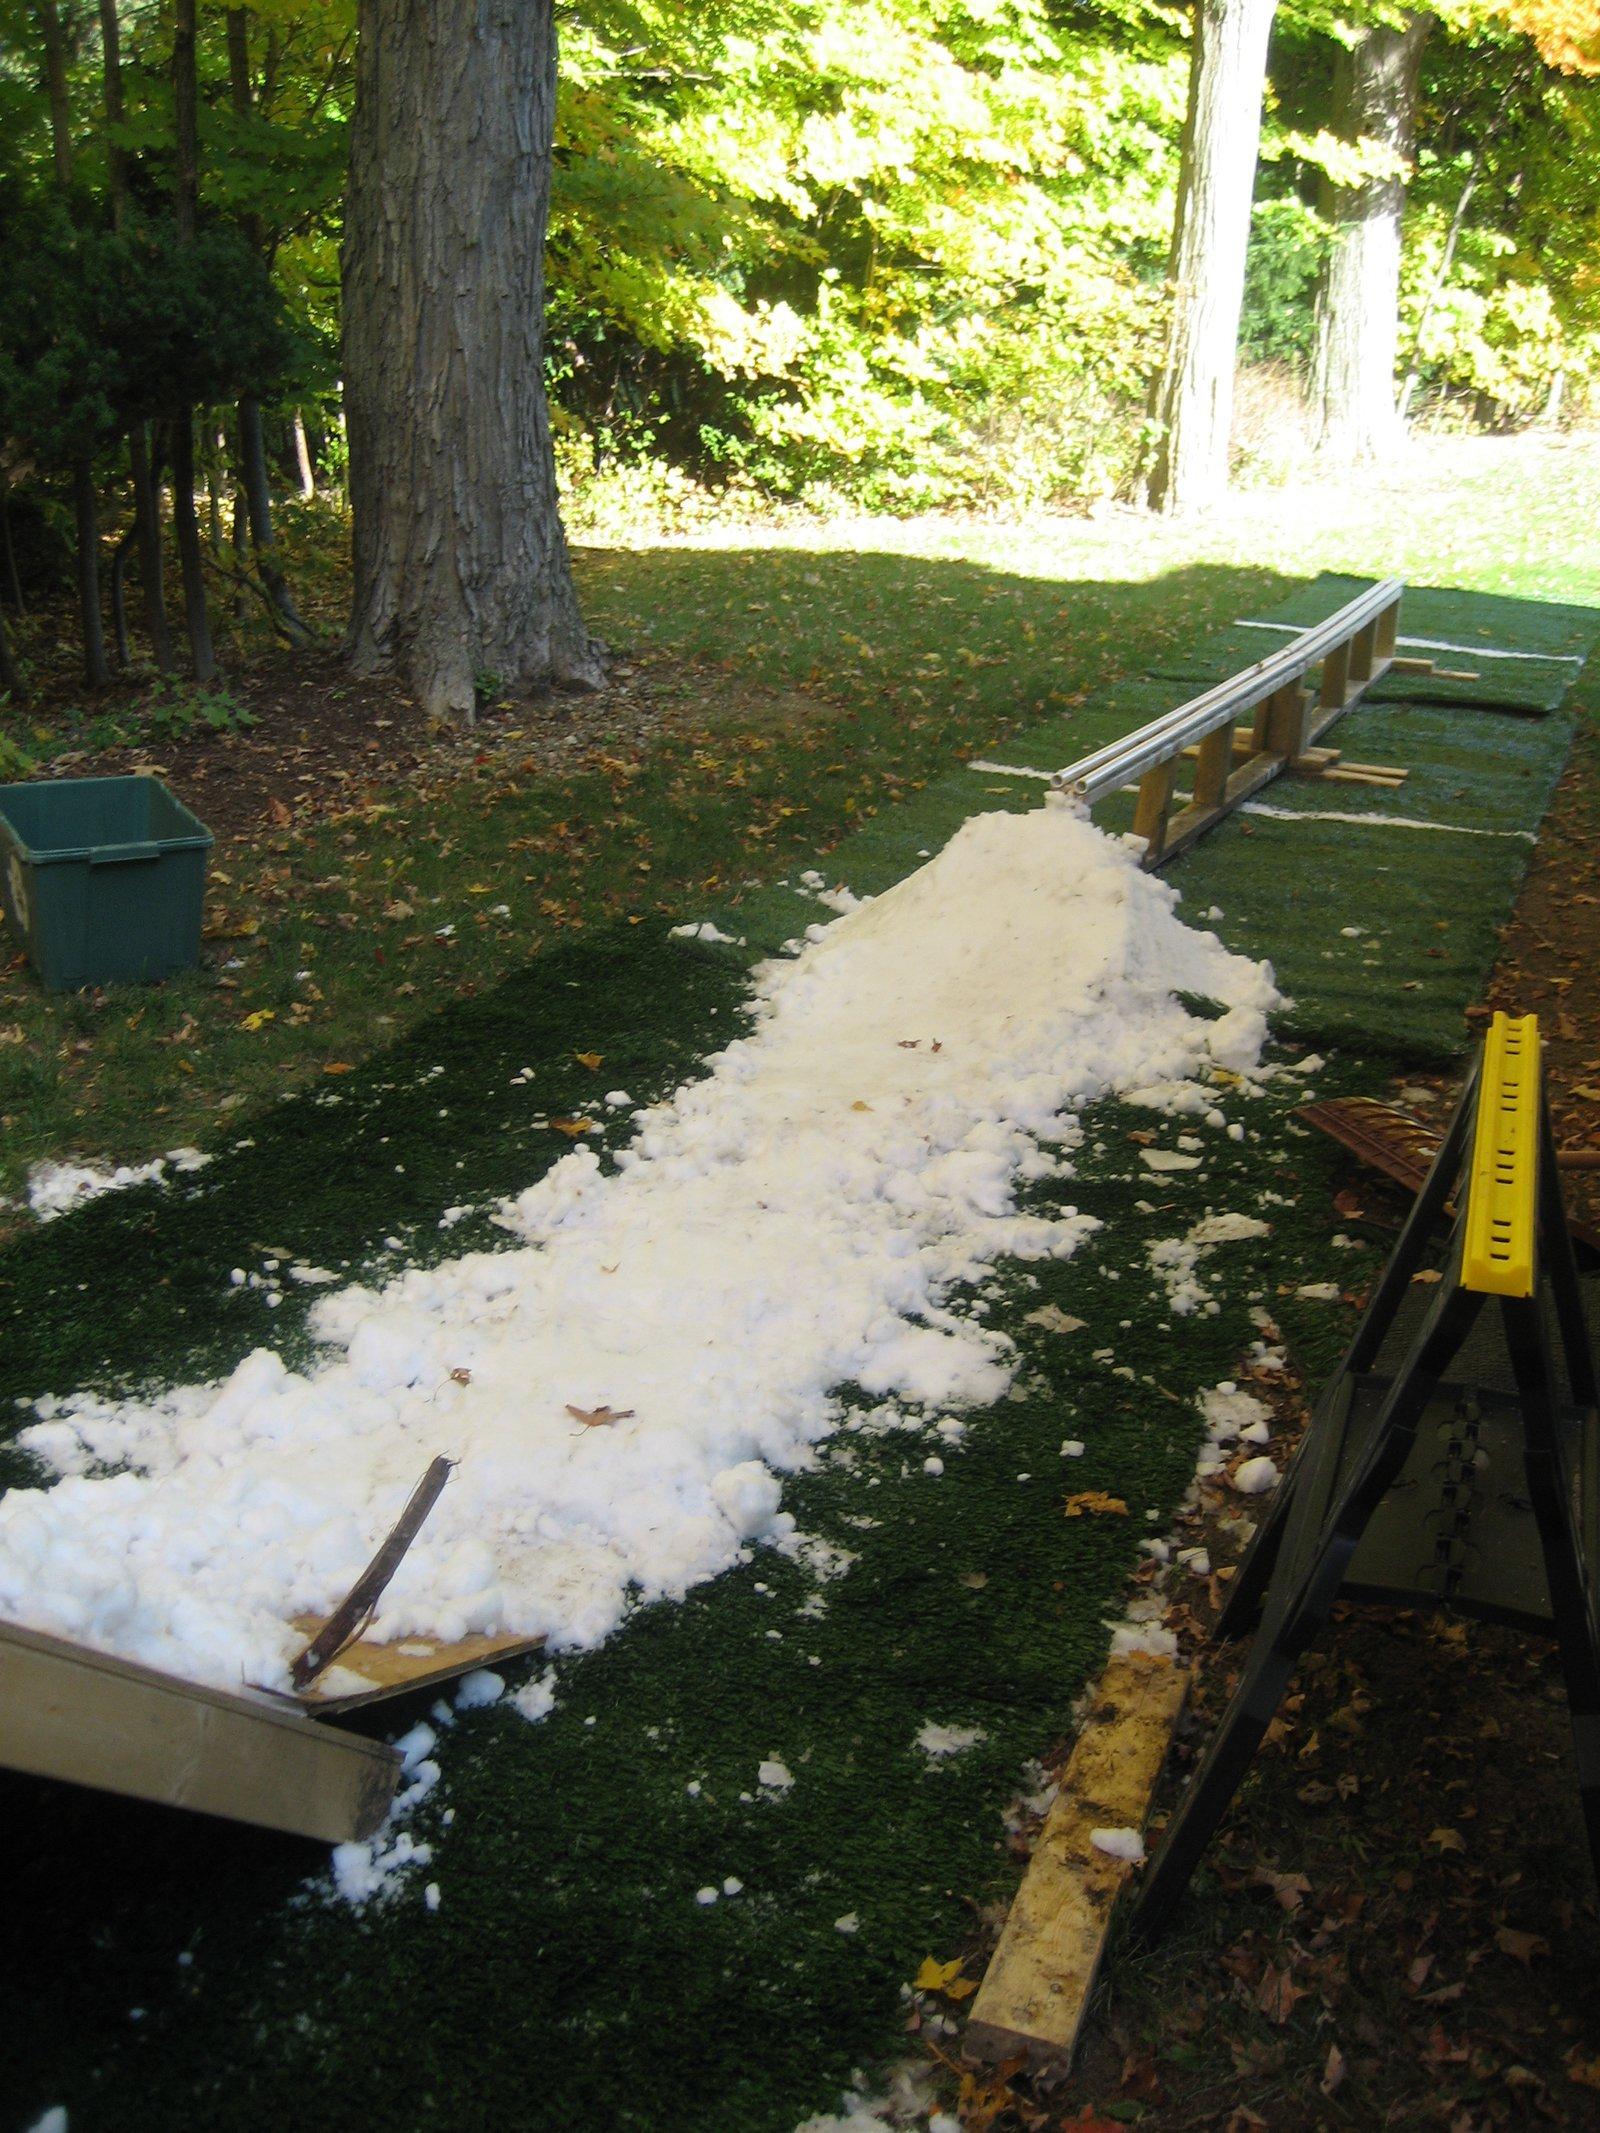 Setup with a little snow